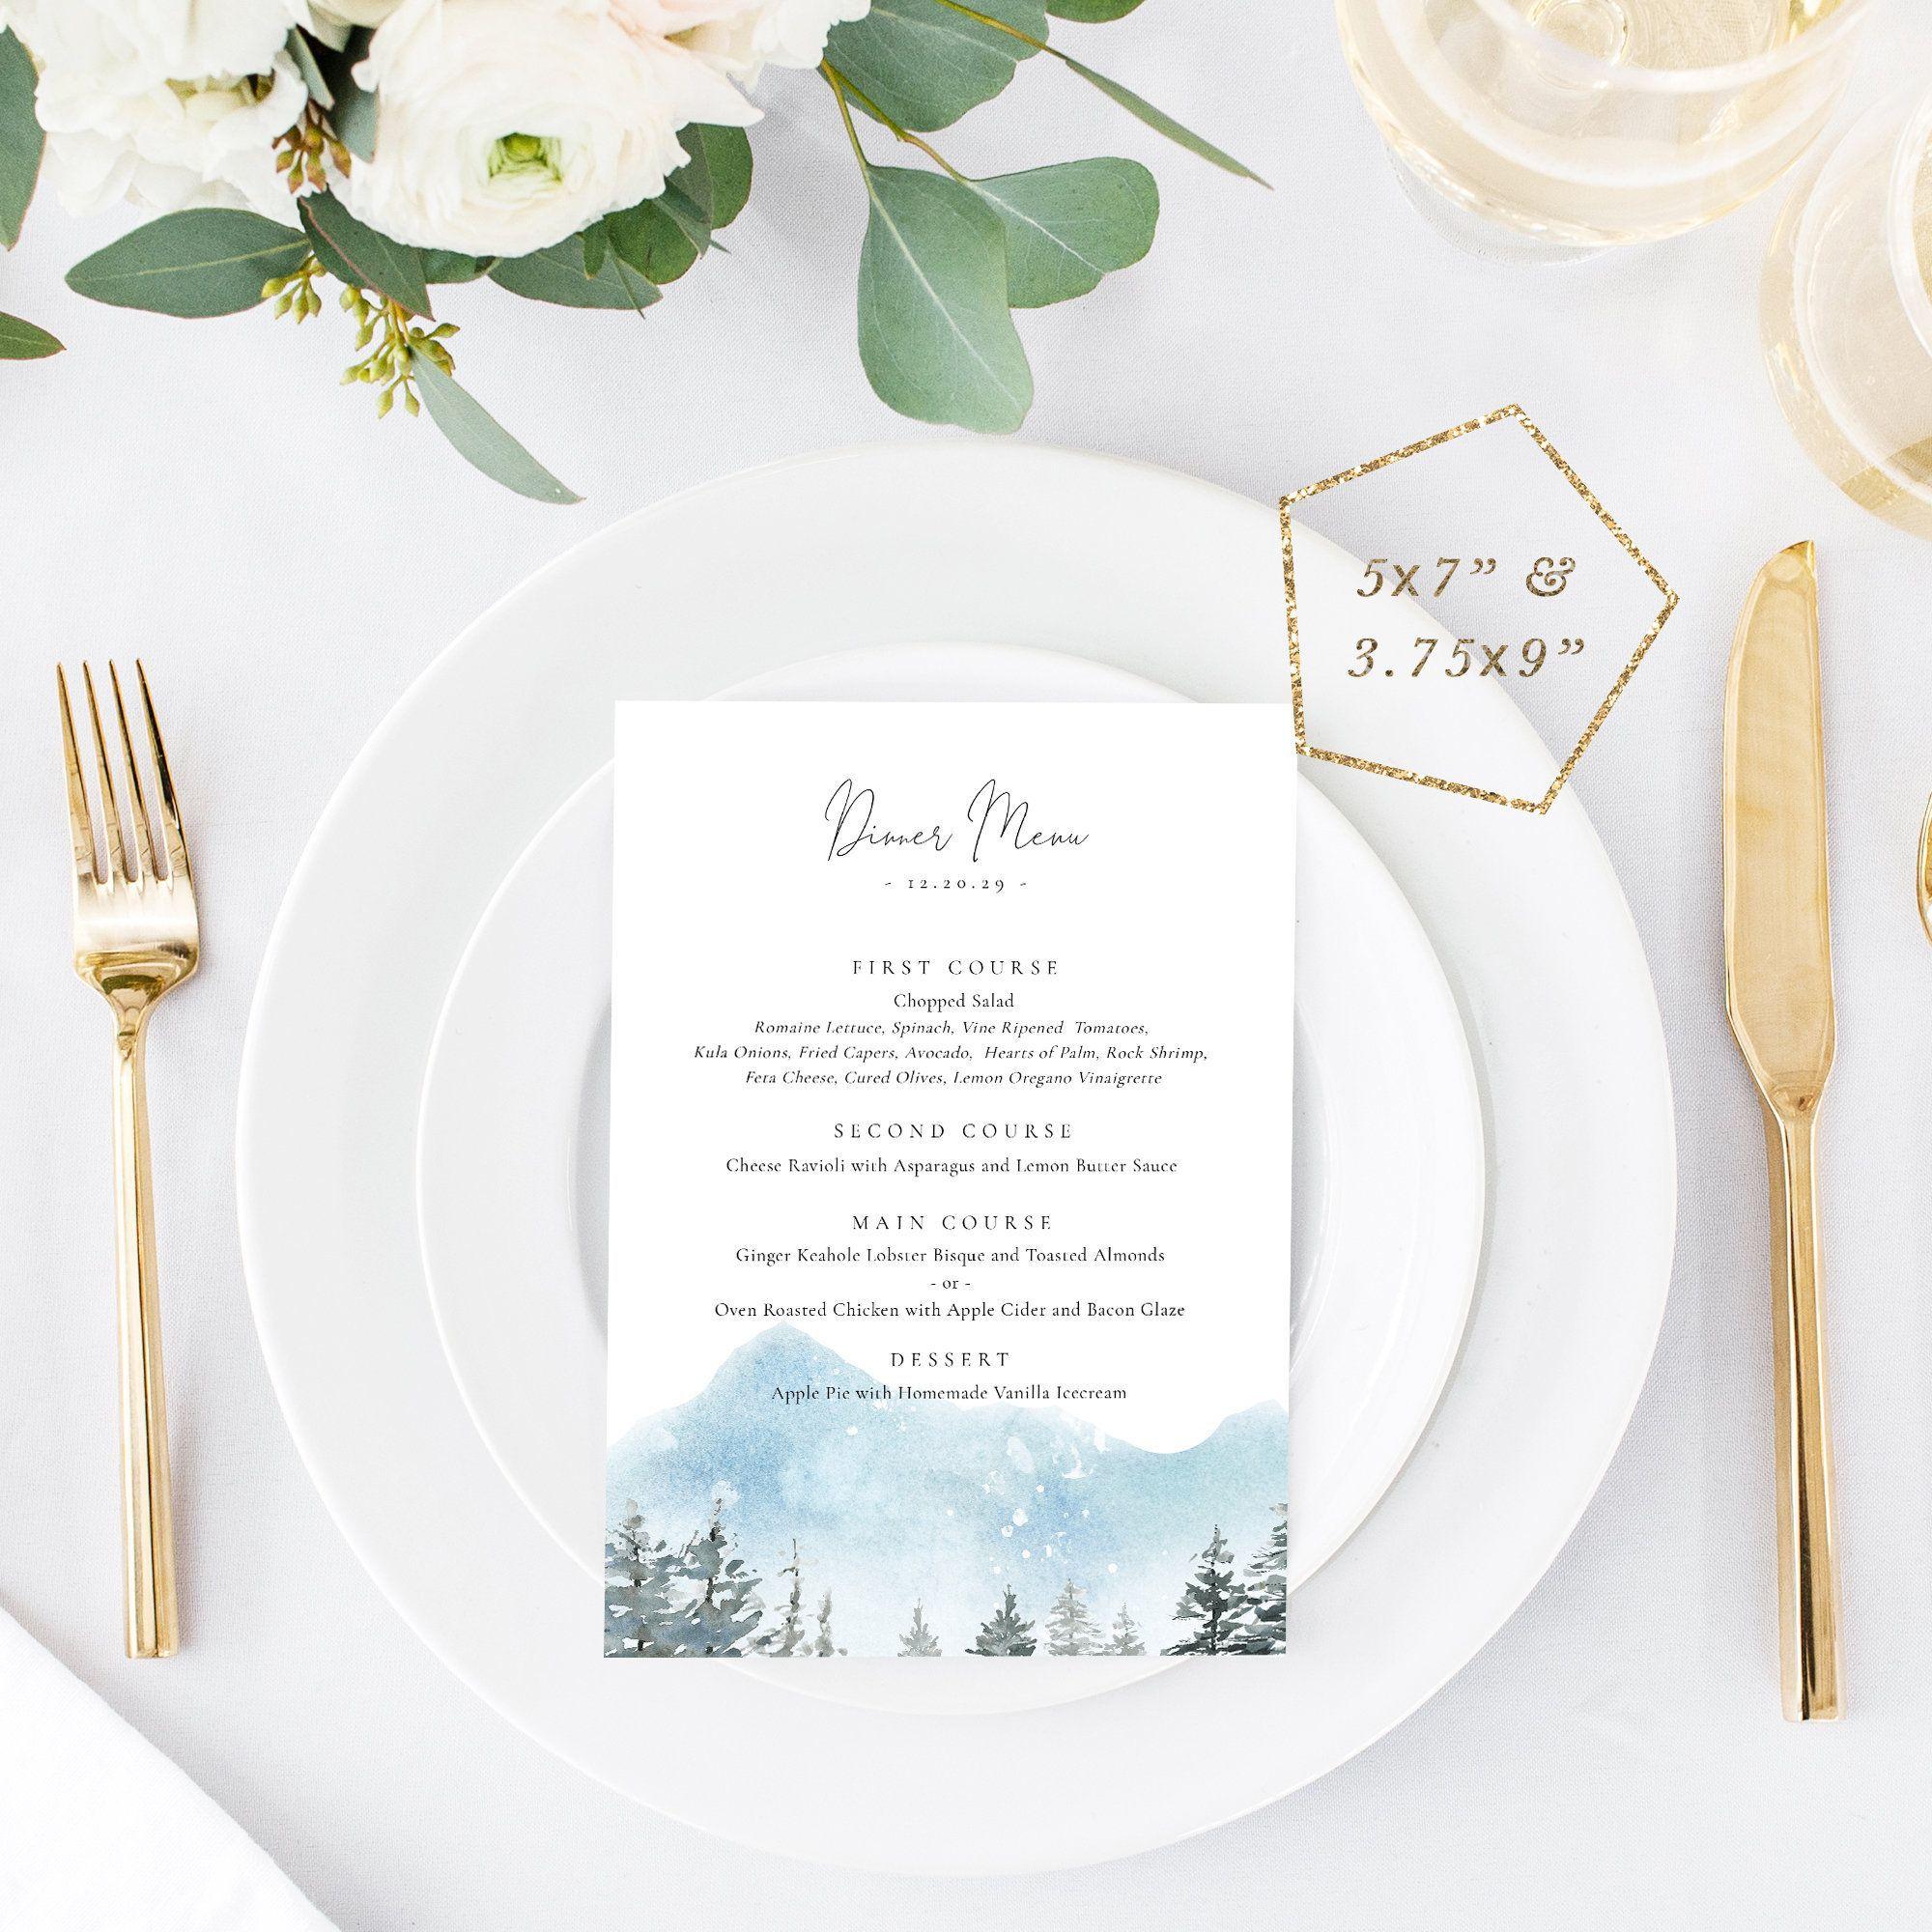 001 Excellent Dinner Party Menu Template Sample  Word Elegant Free Google DocFull